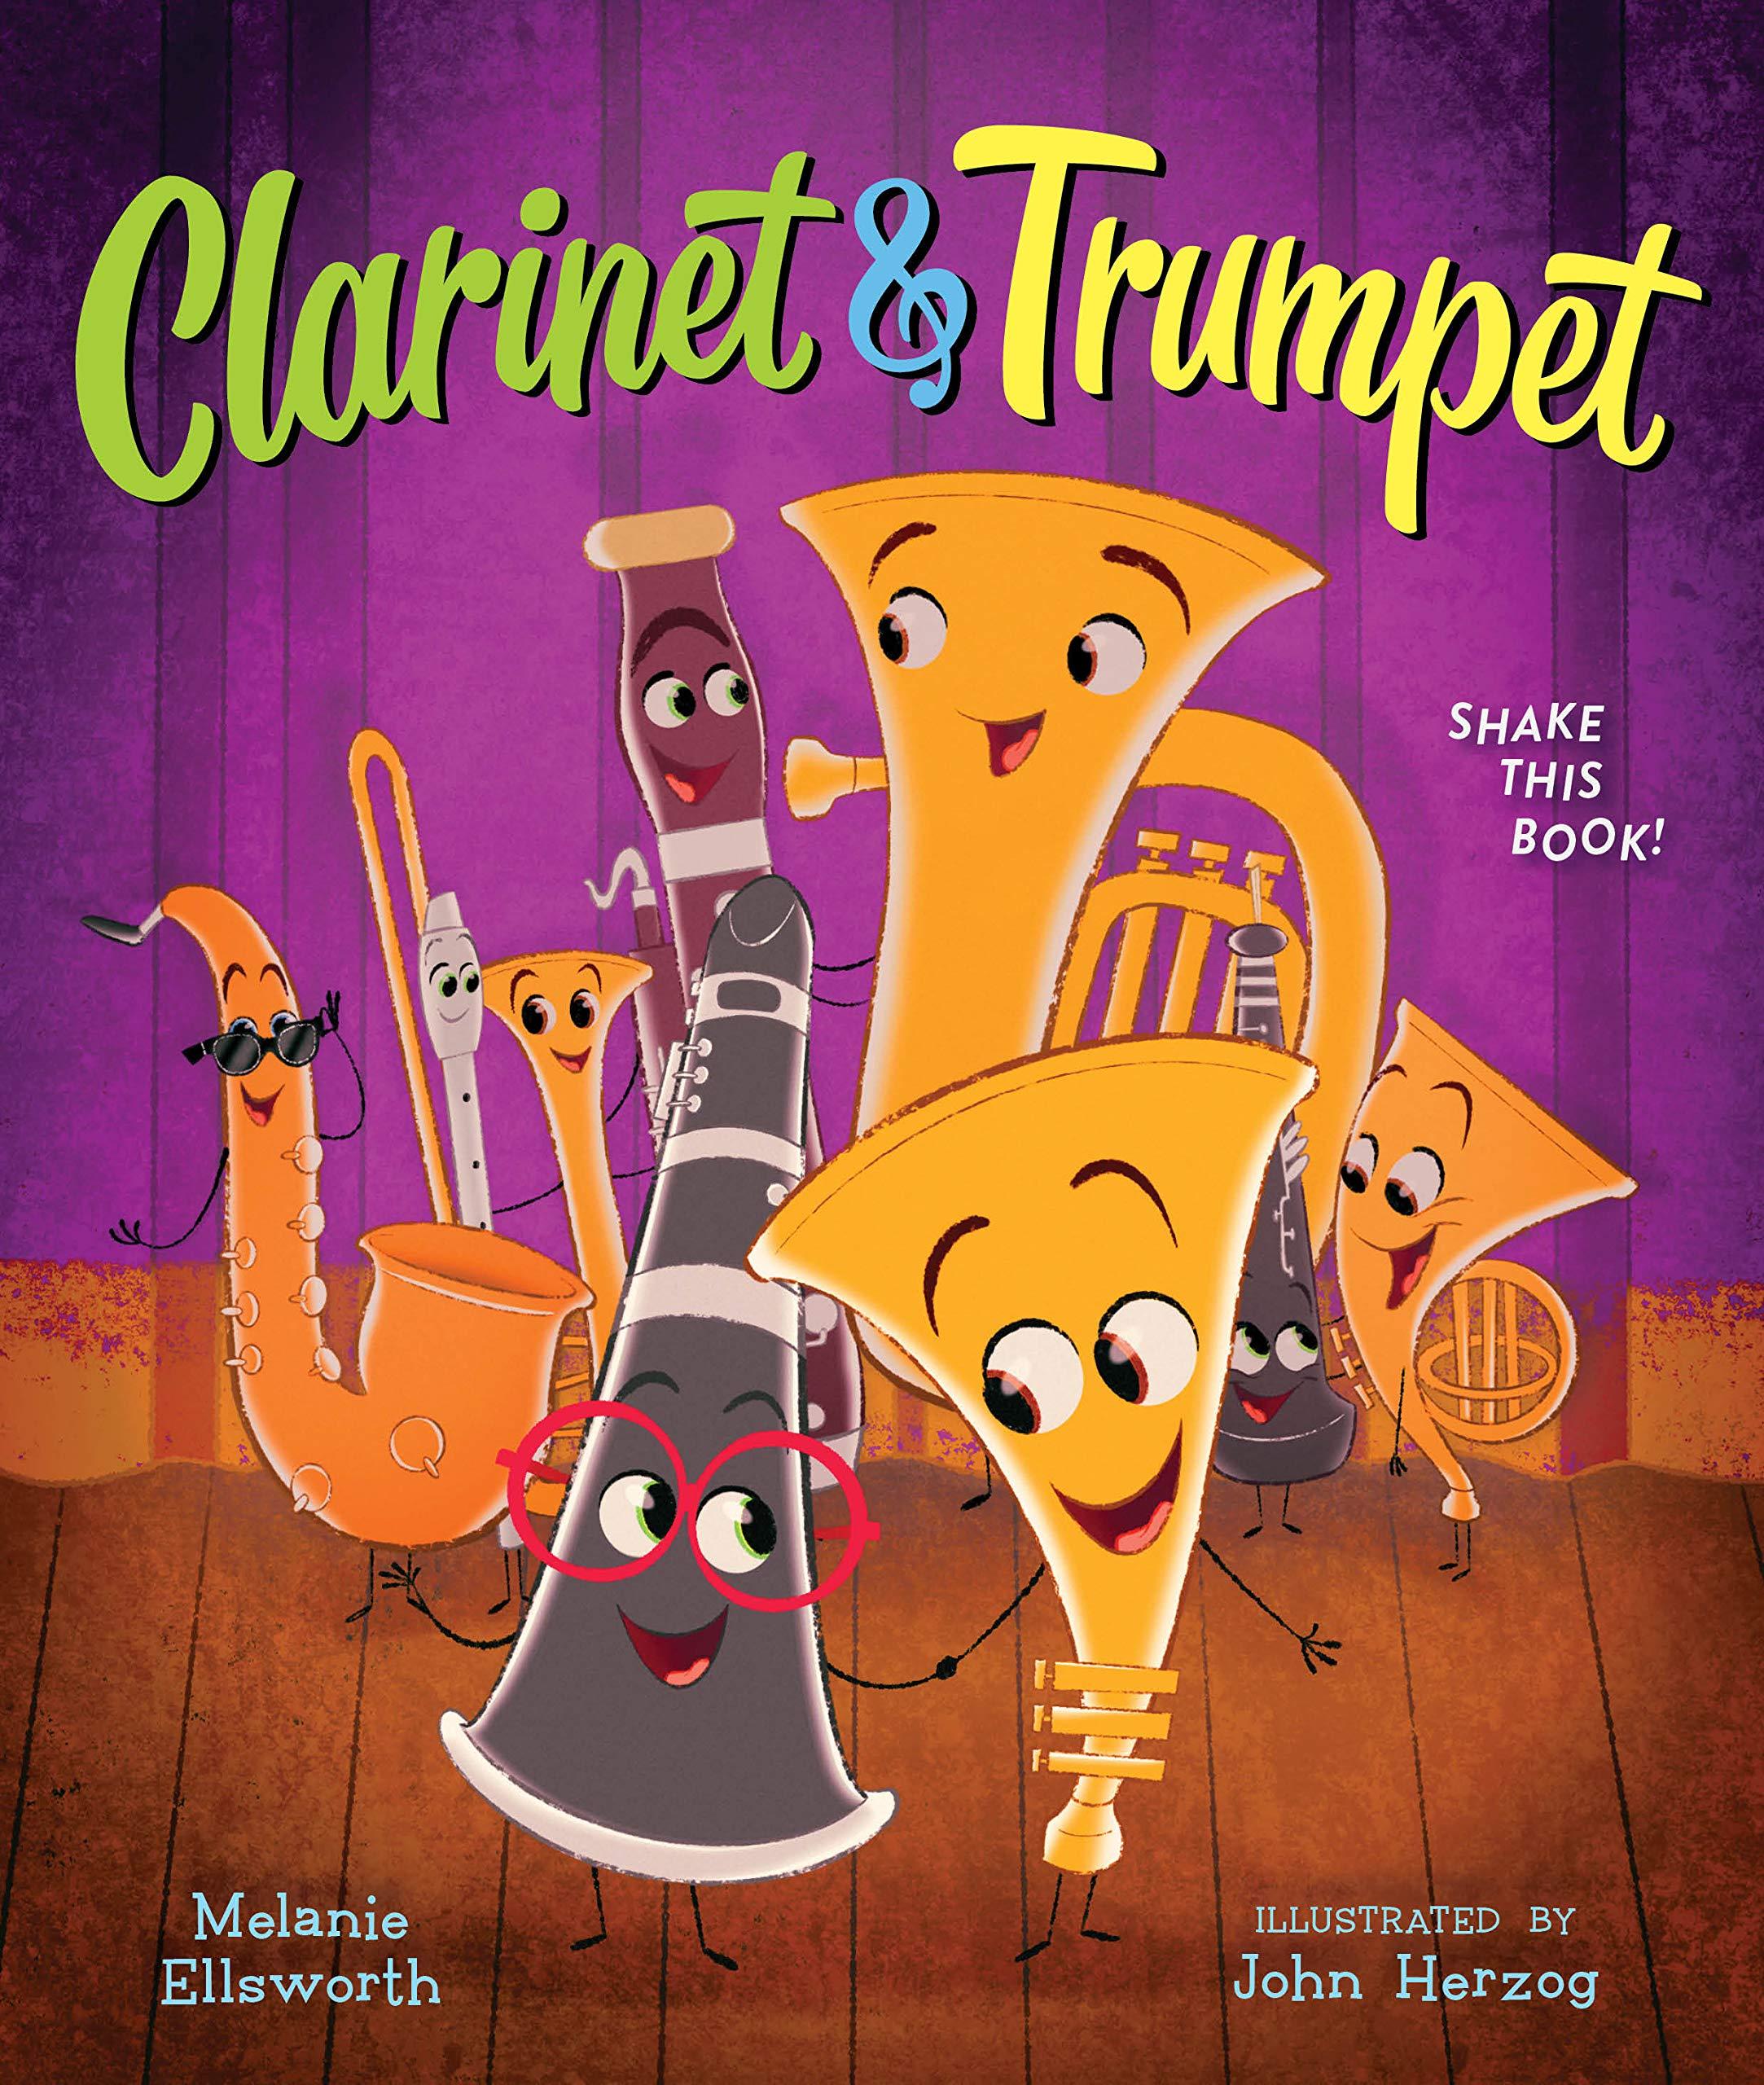 Clarinet and Trumpet (book with shaker): Ellsworth, Melanie, Herzog, John:  9780358107477: Amazon.com: Books